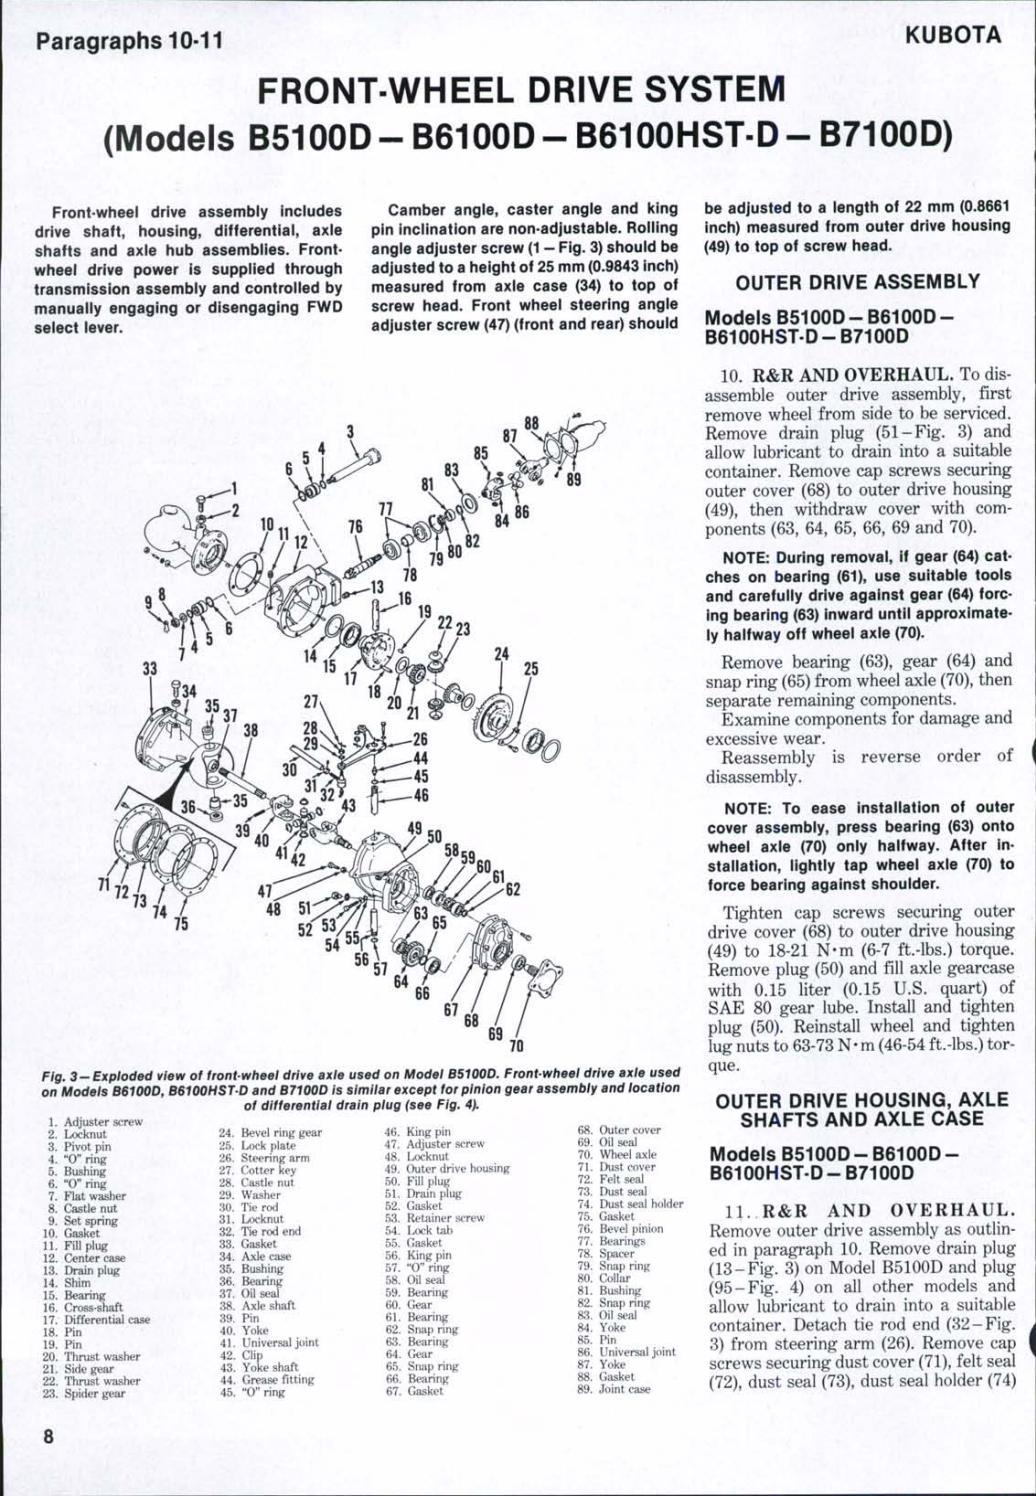 Kubota B5100D Tractor Service Repair Manual by 1639483 - issuu